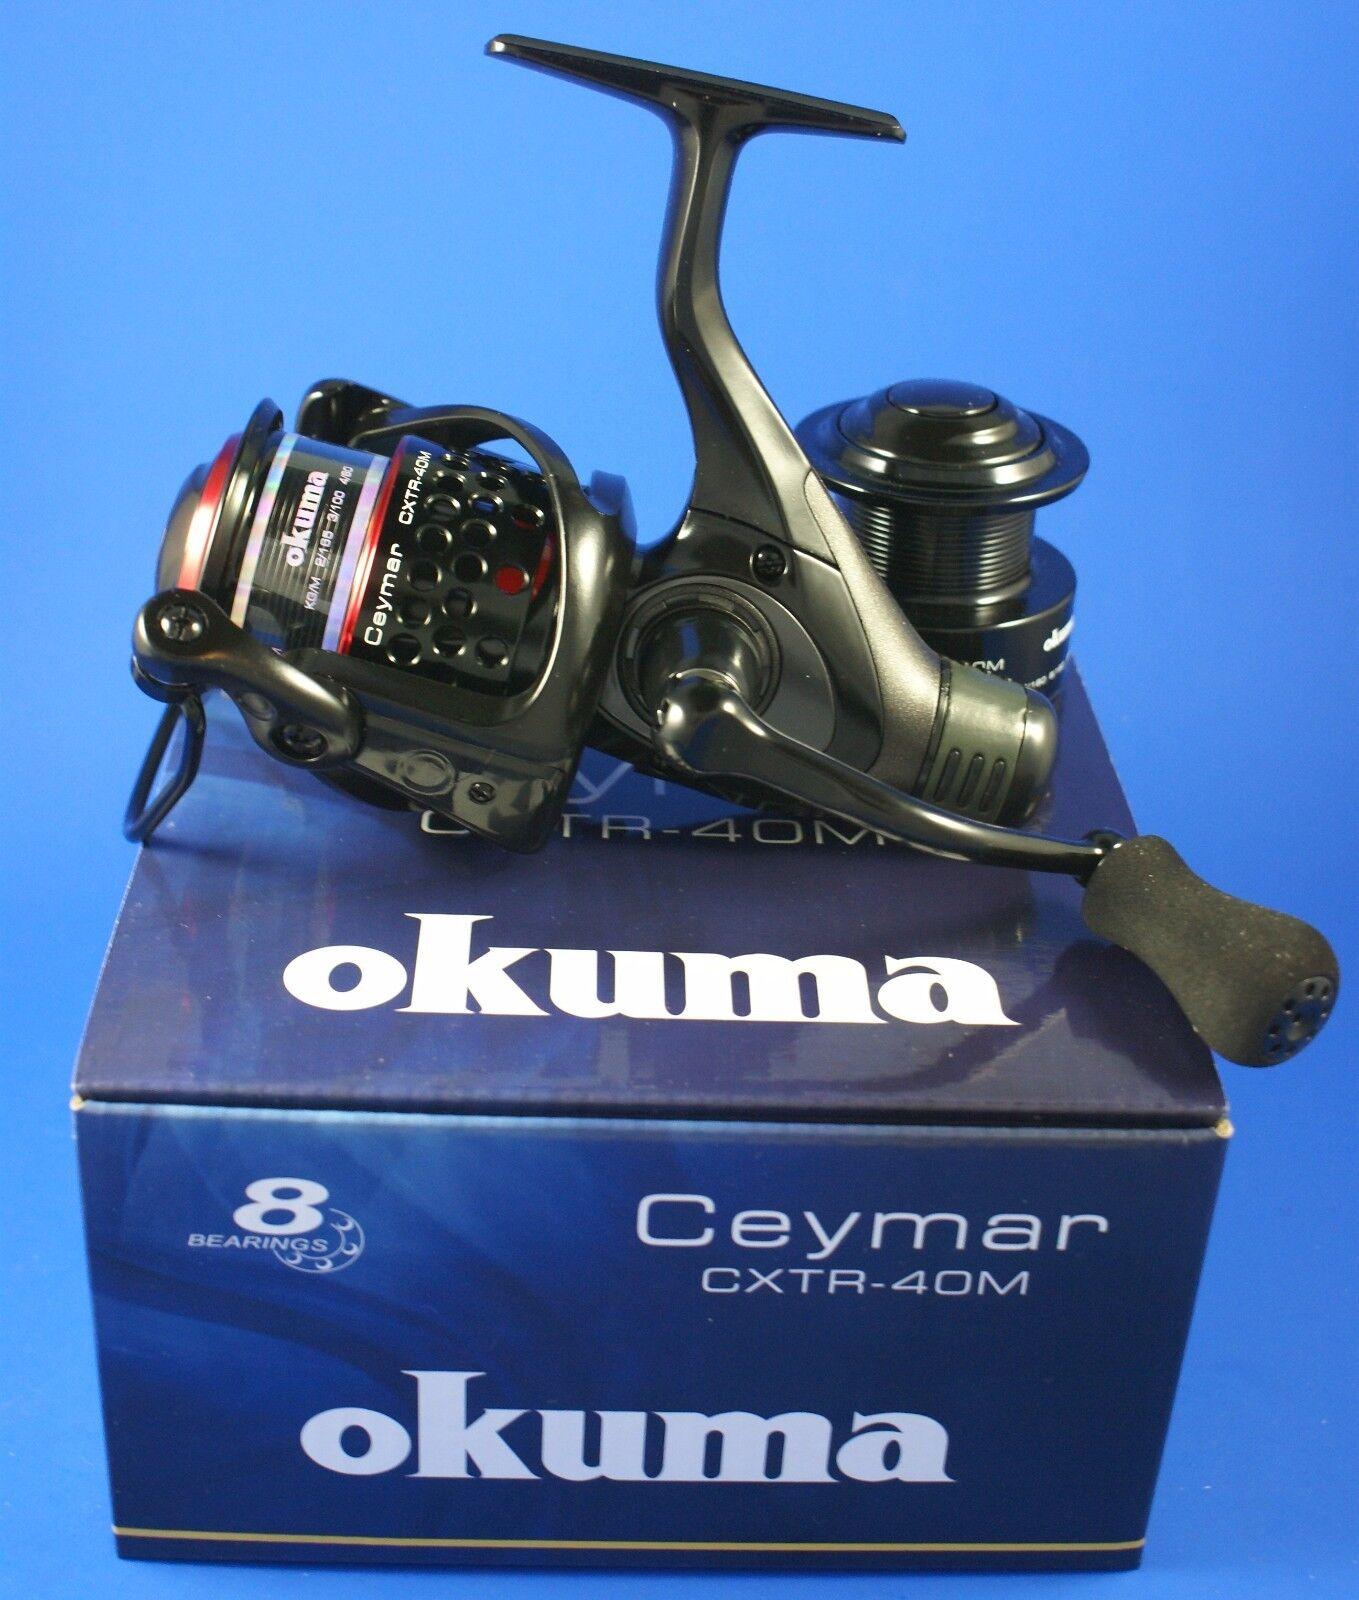 Okuma Ceymar XT Match CXTR-40M RD 7+1BB 6.2 1 54283 Rear Drag Fishing Reel